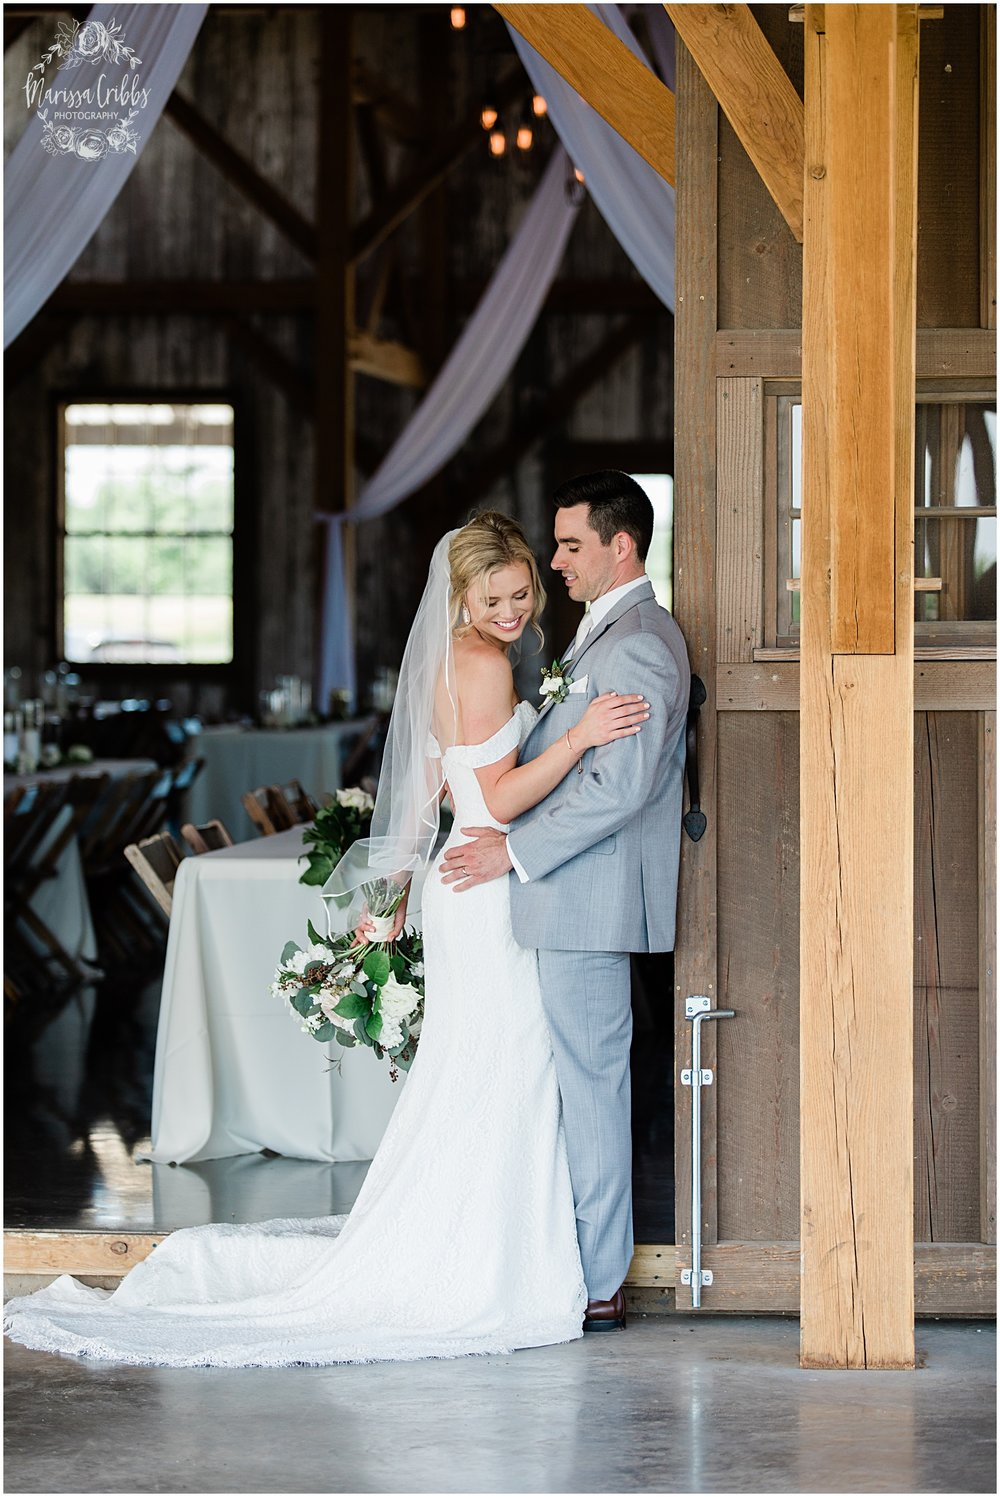 RHODES WEDDING | WESTON RED BARN FARM | MARISSA CRIBBS PHOTOGRAPHY_5246.jpg